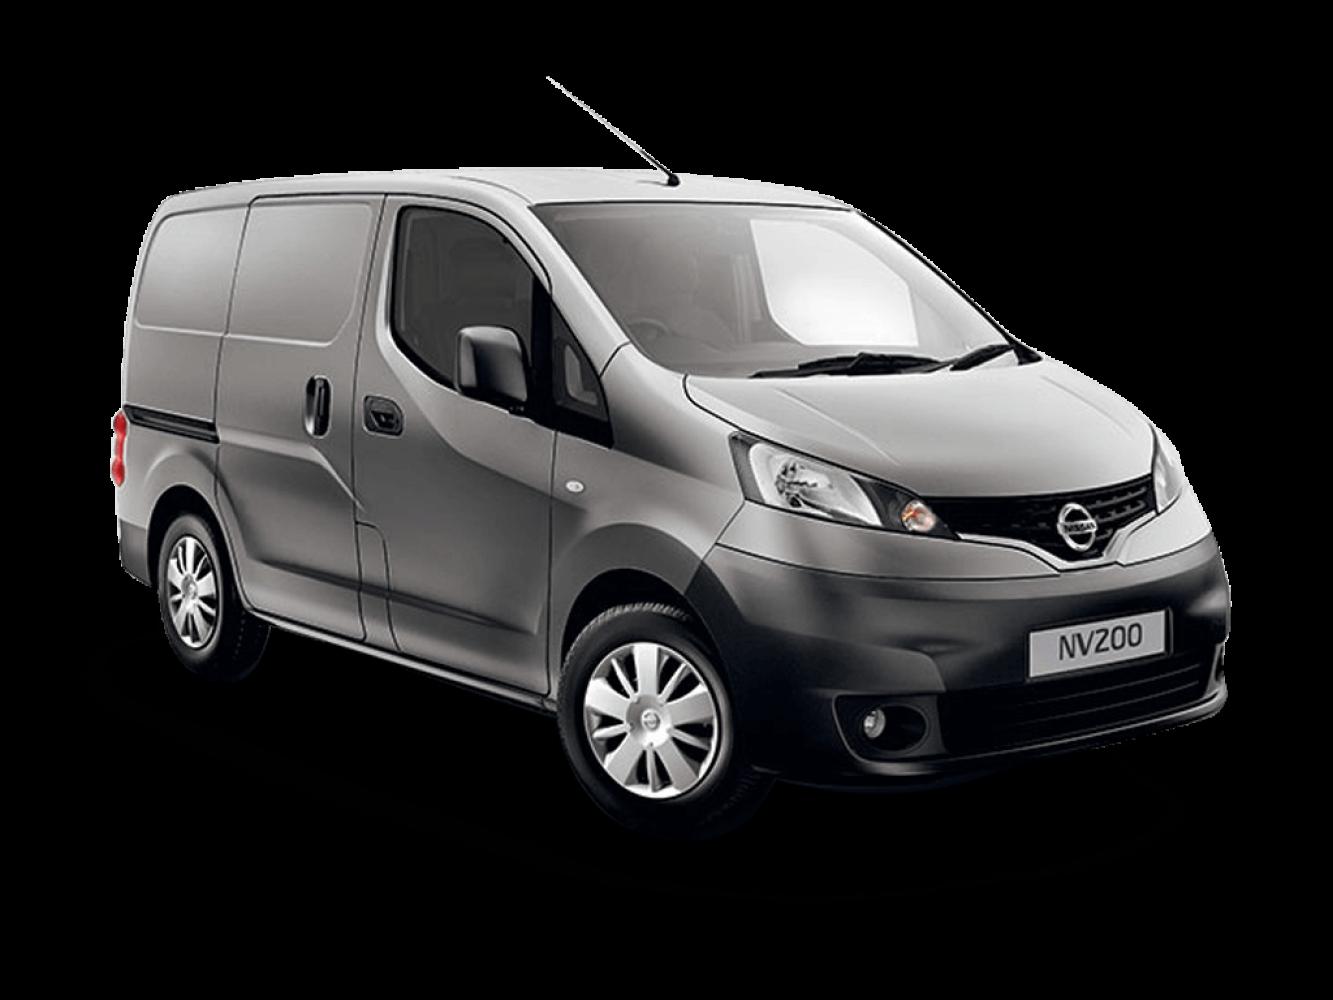 new nissan nv200 diesel 1 5 dci acenta van euro 6 for sale macklin rh macklinmotors co uk Nissan NV200 Interior Nissan NV200 Cargo Van